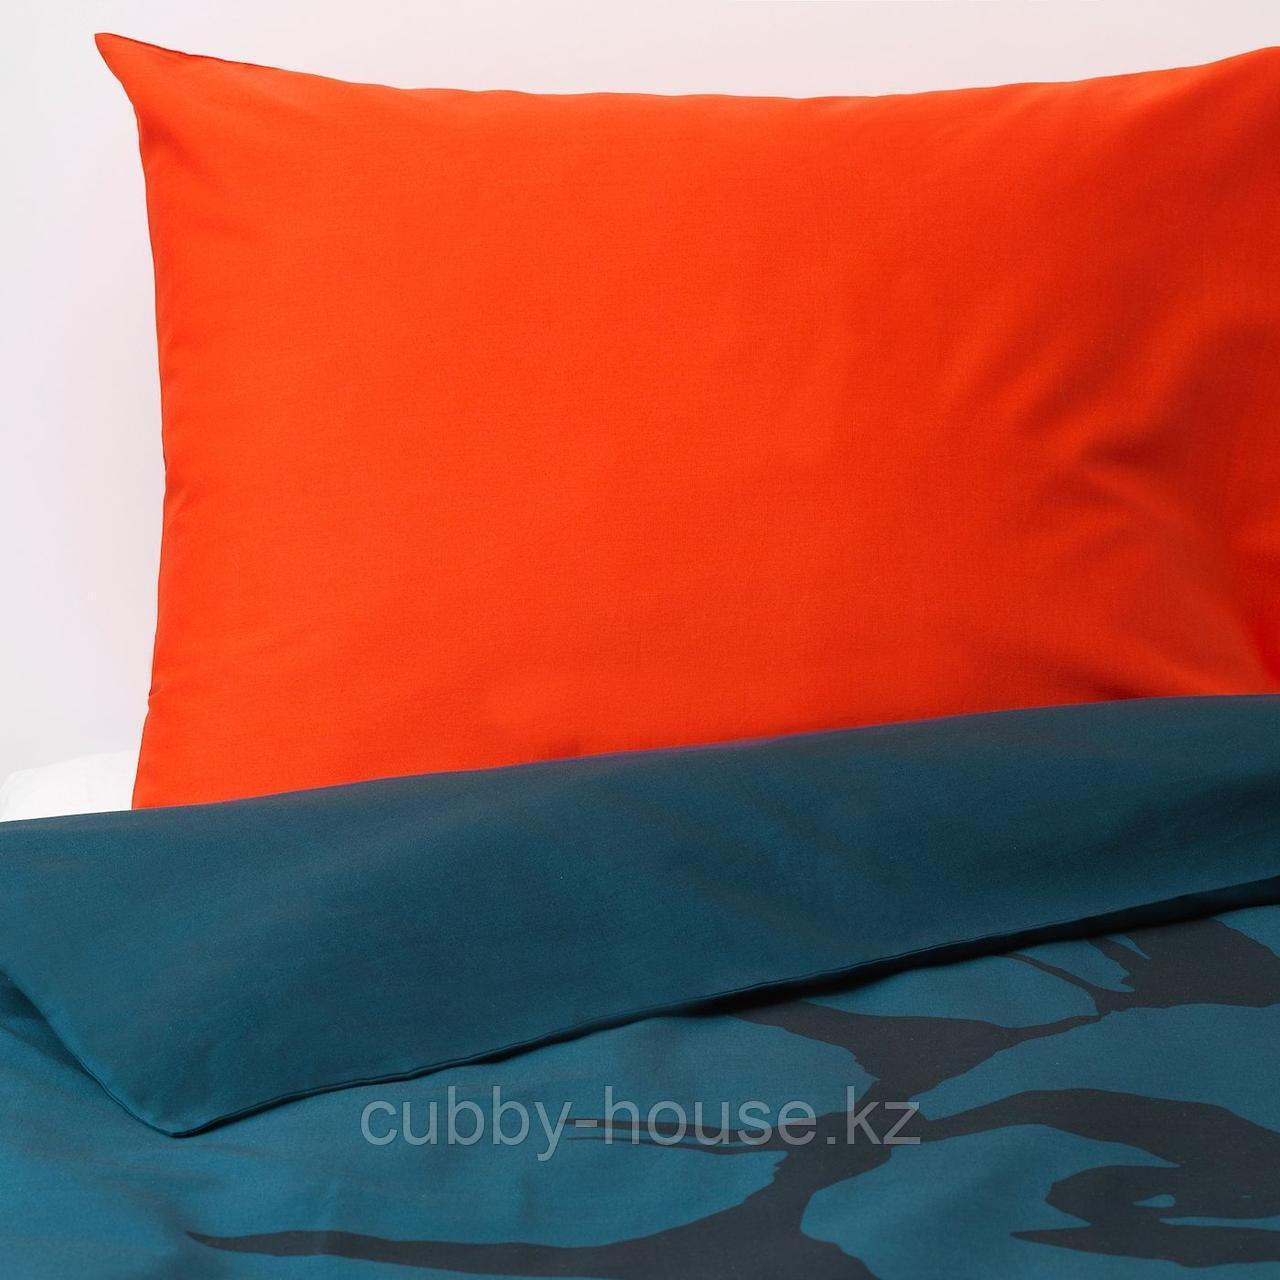 УРСКОГ Пододеяльник и 1 наволочка, лев, темно-синий, 150x200/50x70 см